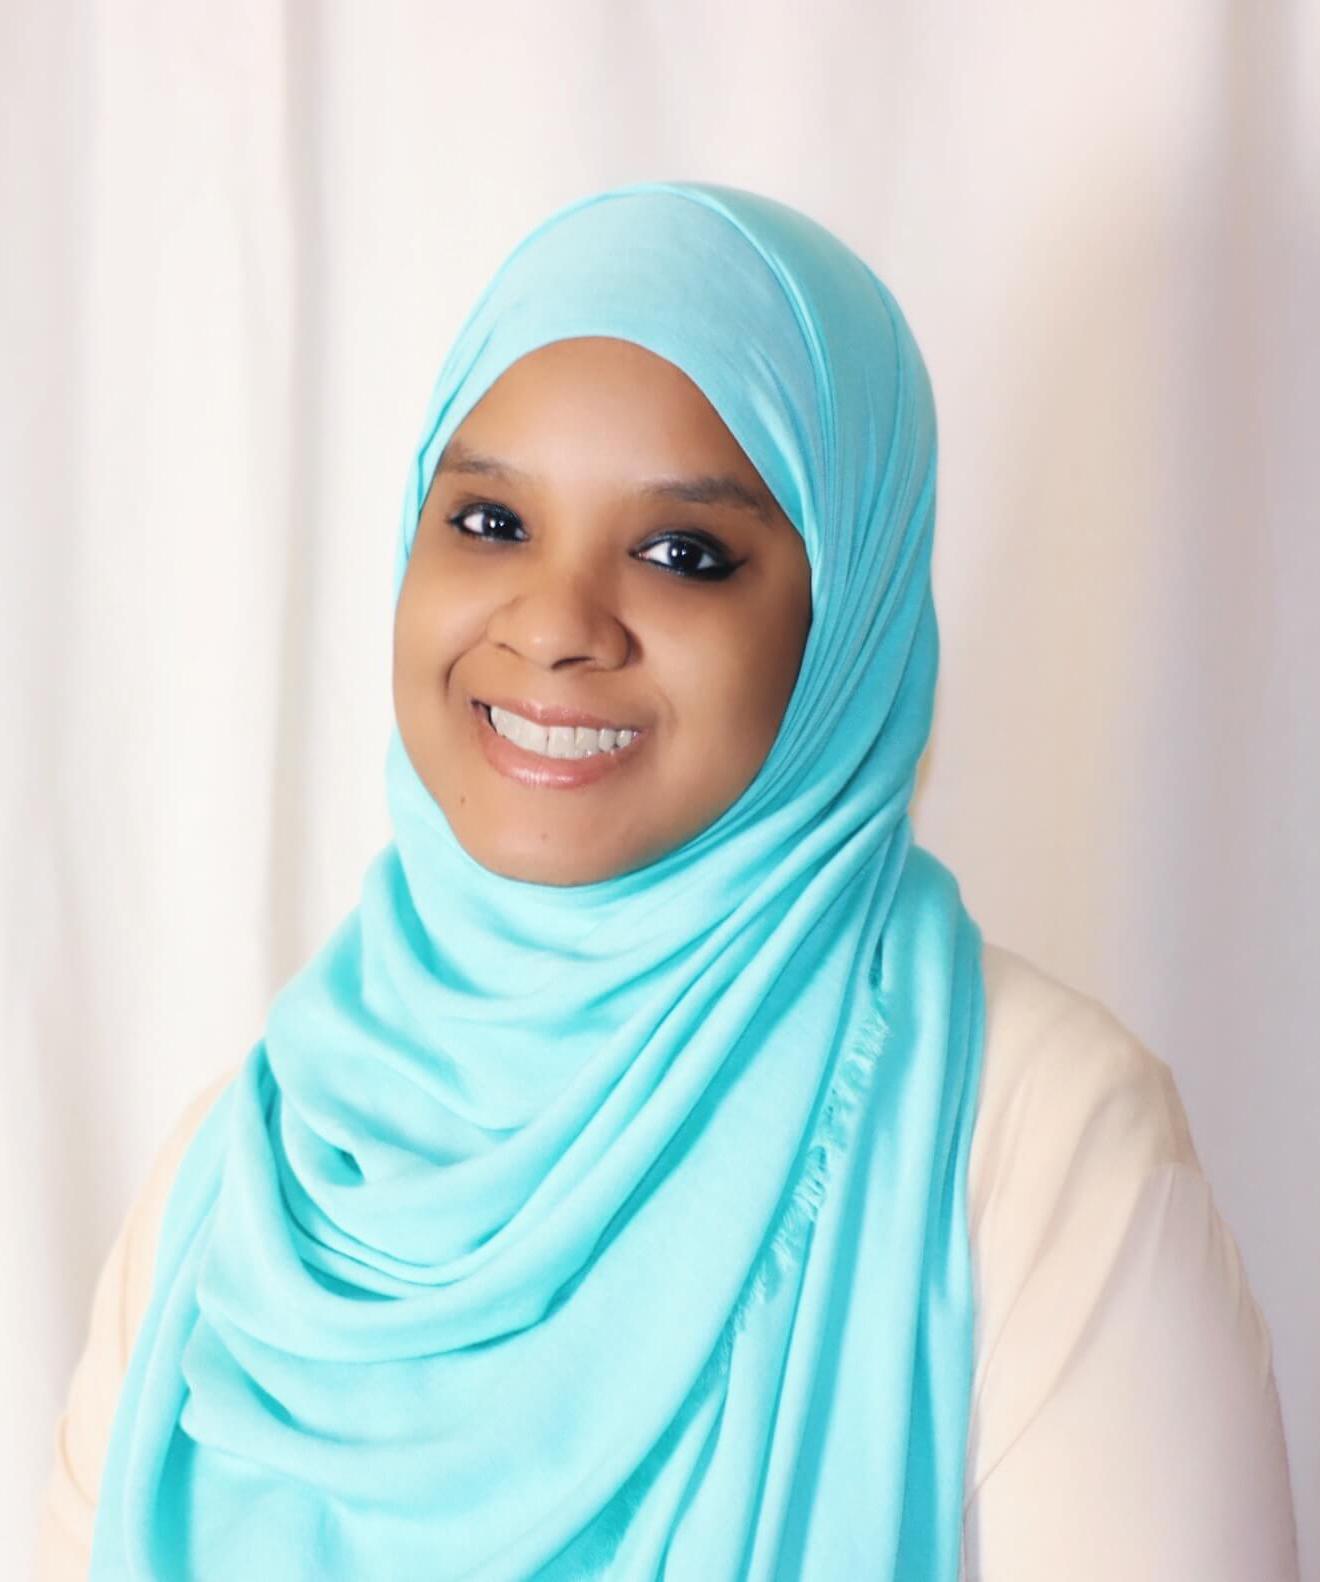 Photo of Umm Zakiyyah in blue hijab